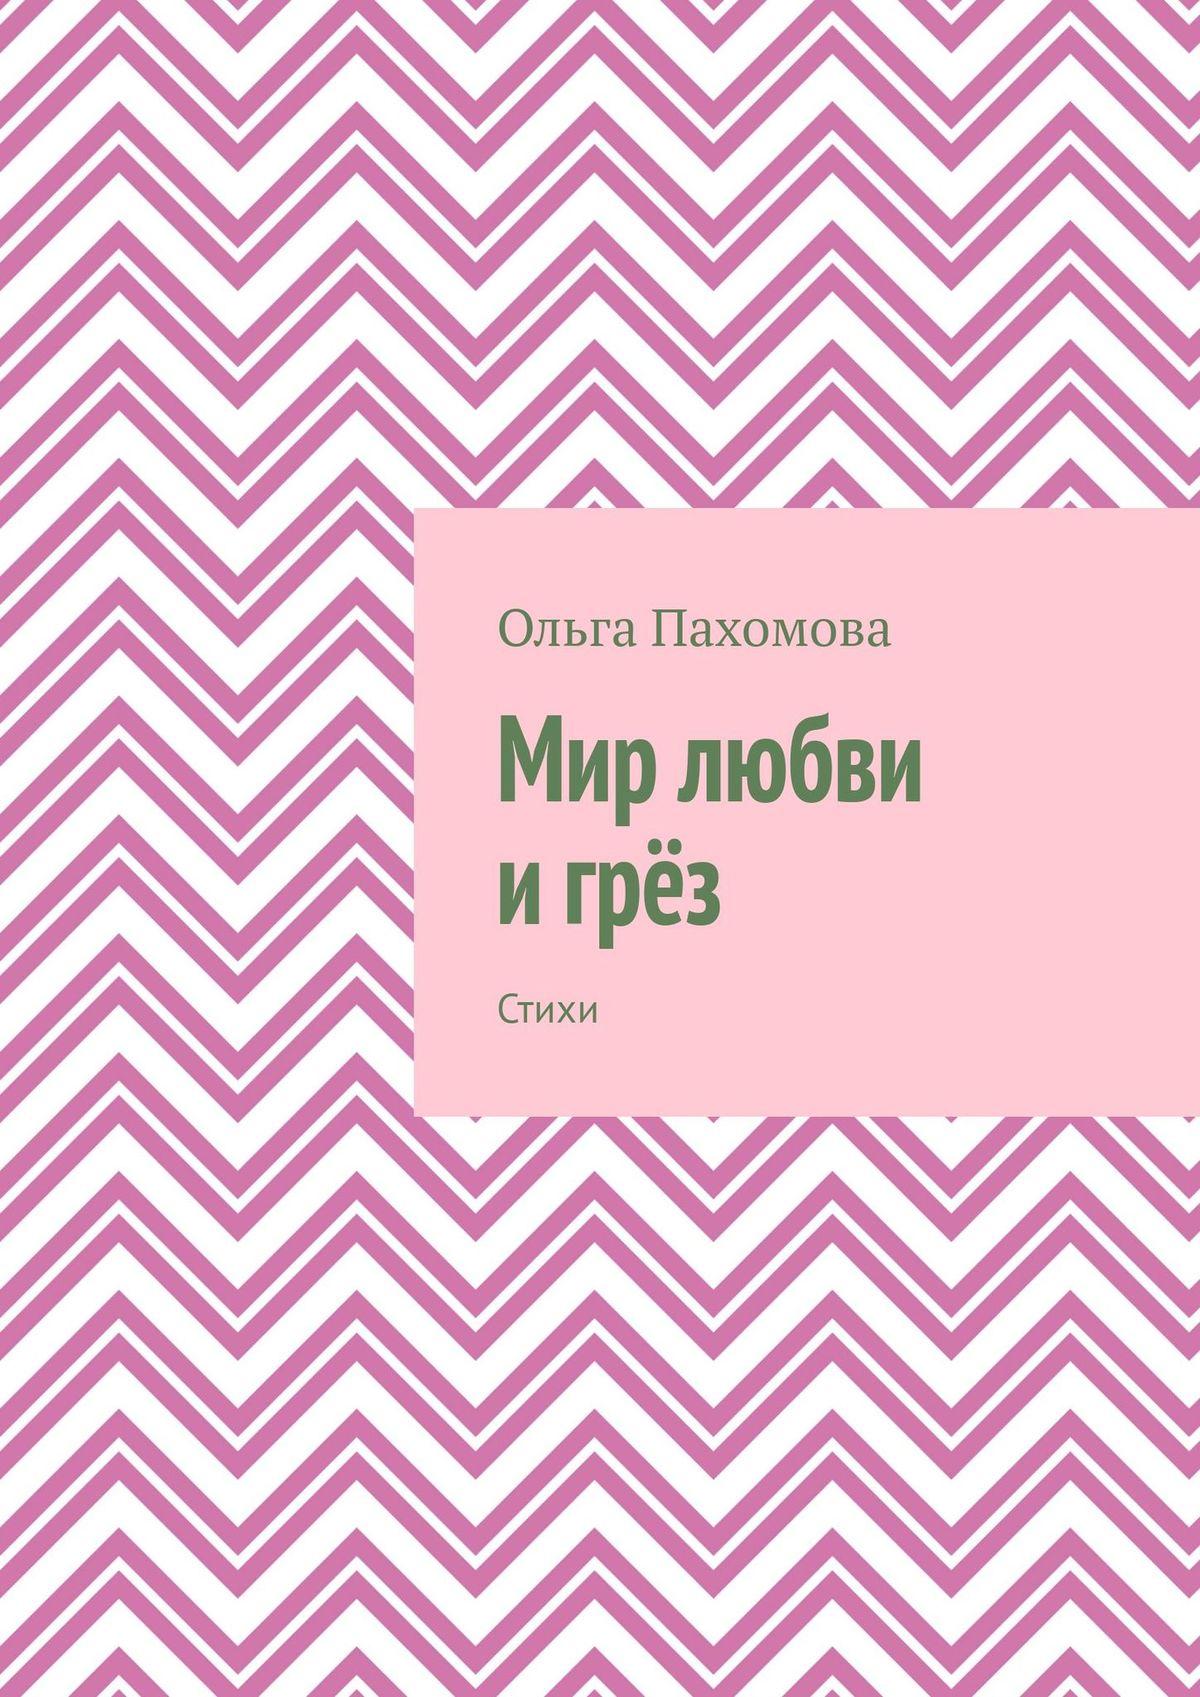 Ольга Пахомова Мир любви и грёз. Стихи ольга пахомова любовь стихи